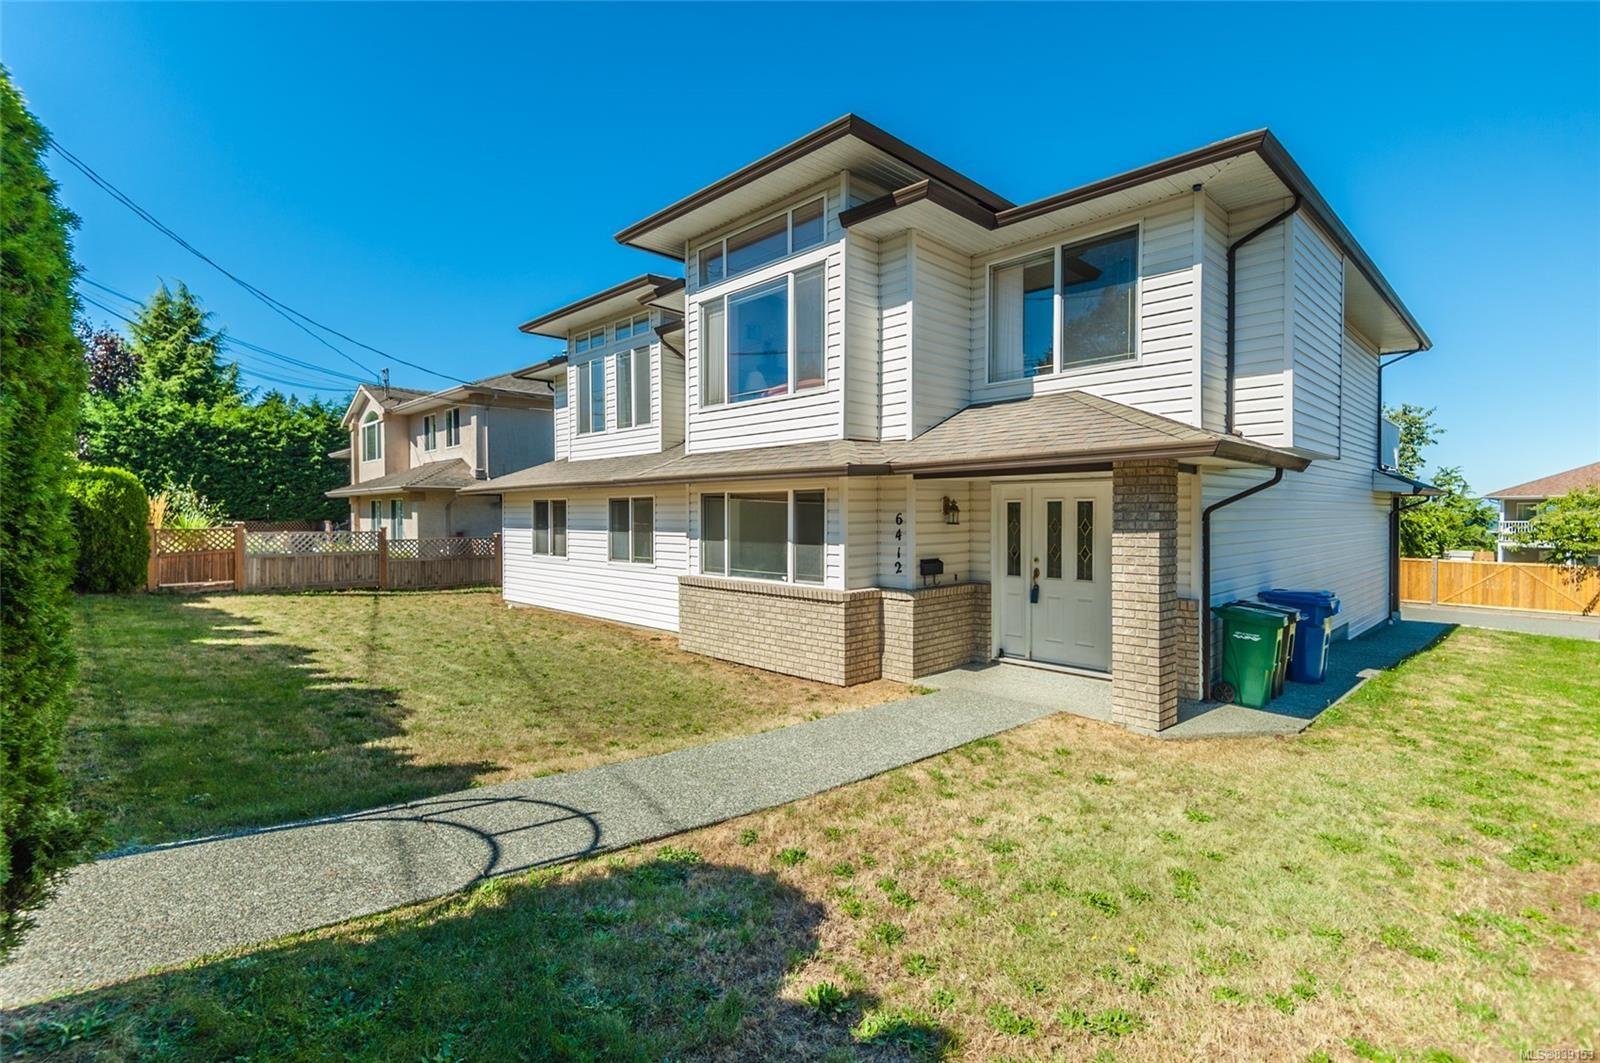 Photo 1: Photos: 6412 Dover Rd in NANAIMO: Na North Nanaimo House for sale (Nanaimo)  : MLS®# 839153